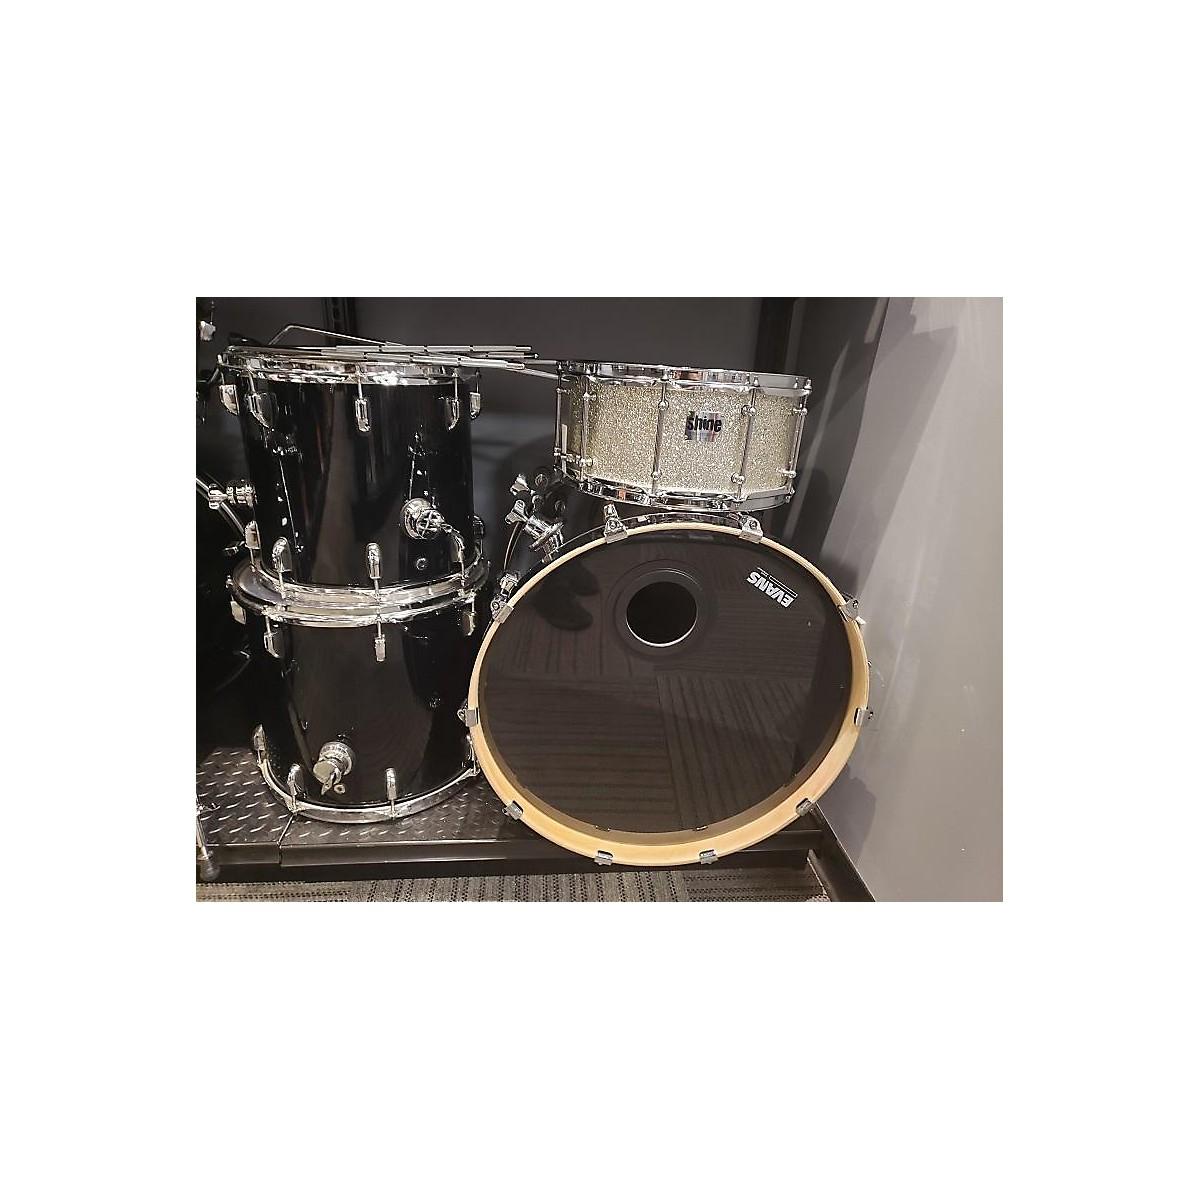 Evans Shine Definition Series Drum Kit